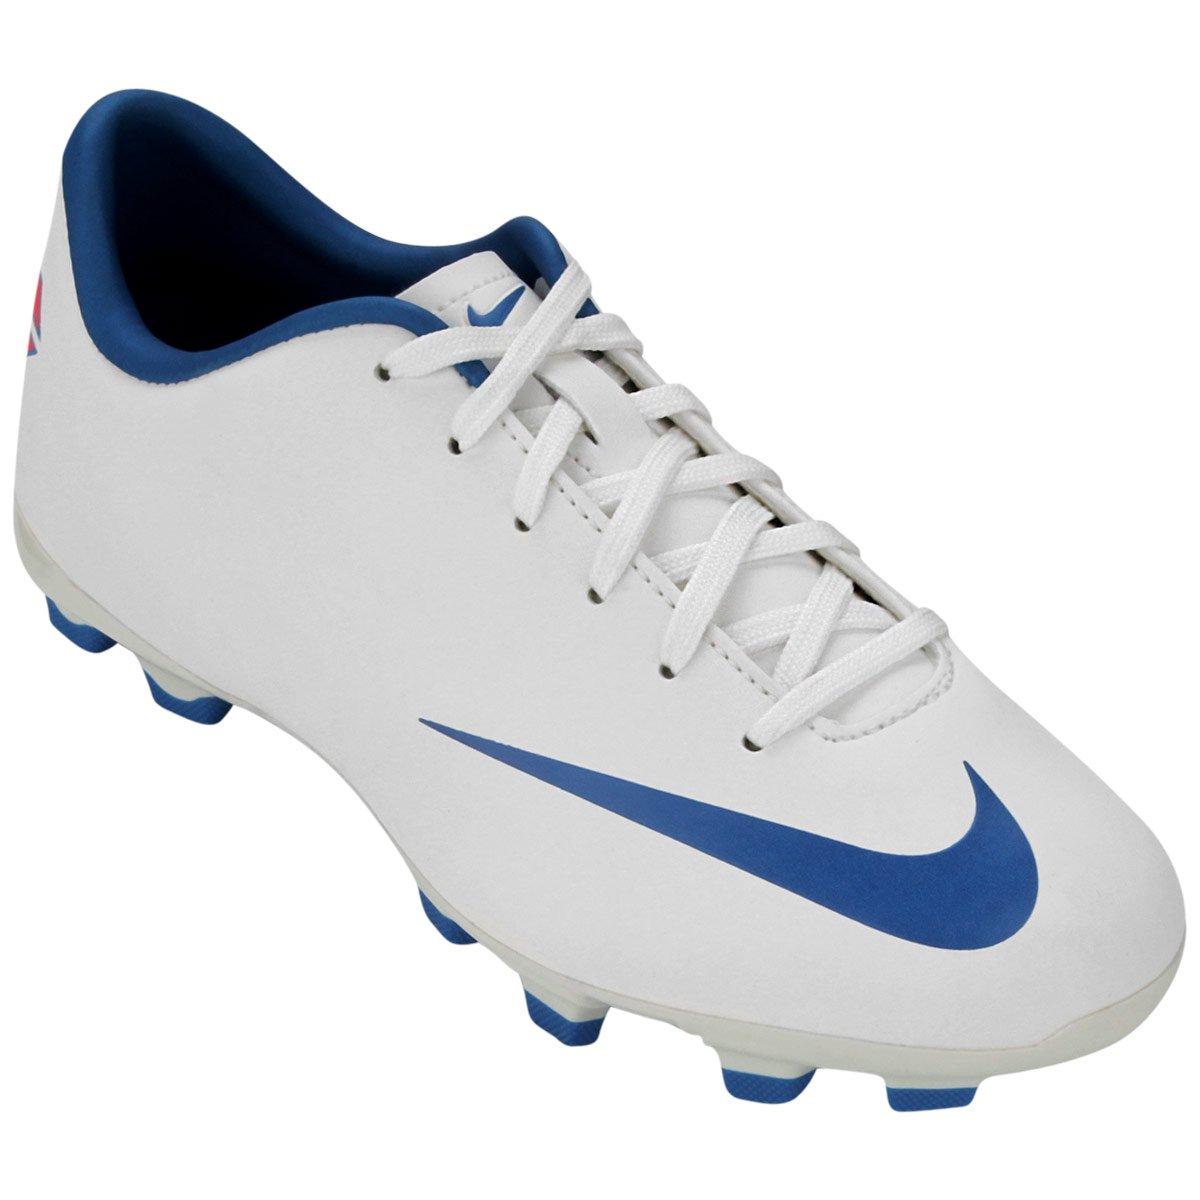 promo code b2623 02263 Chuteira Nike Mercurial Victory 3 FG Infantil   Shop Timão